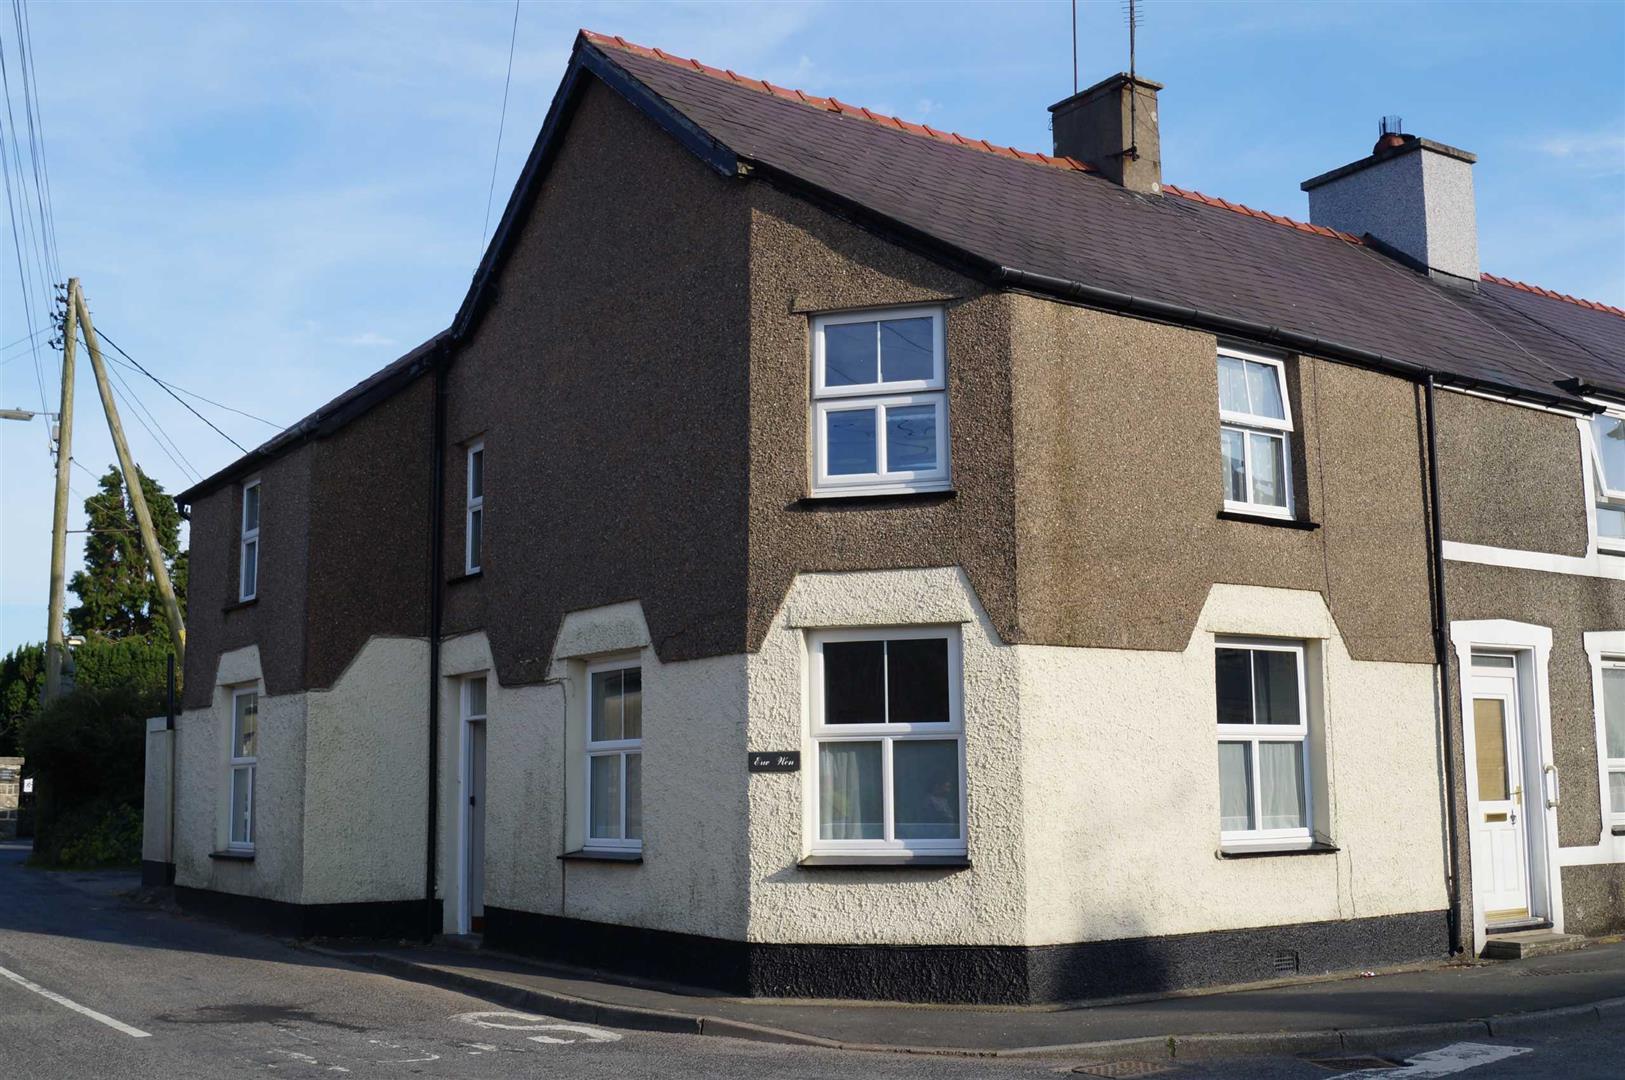 Llanaelhaearn, Caernarfon - £115,000